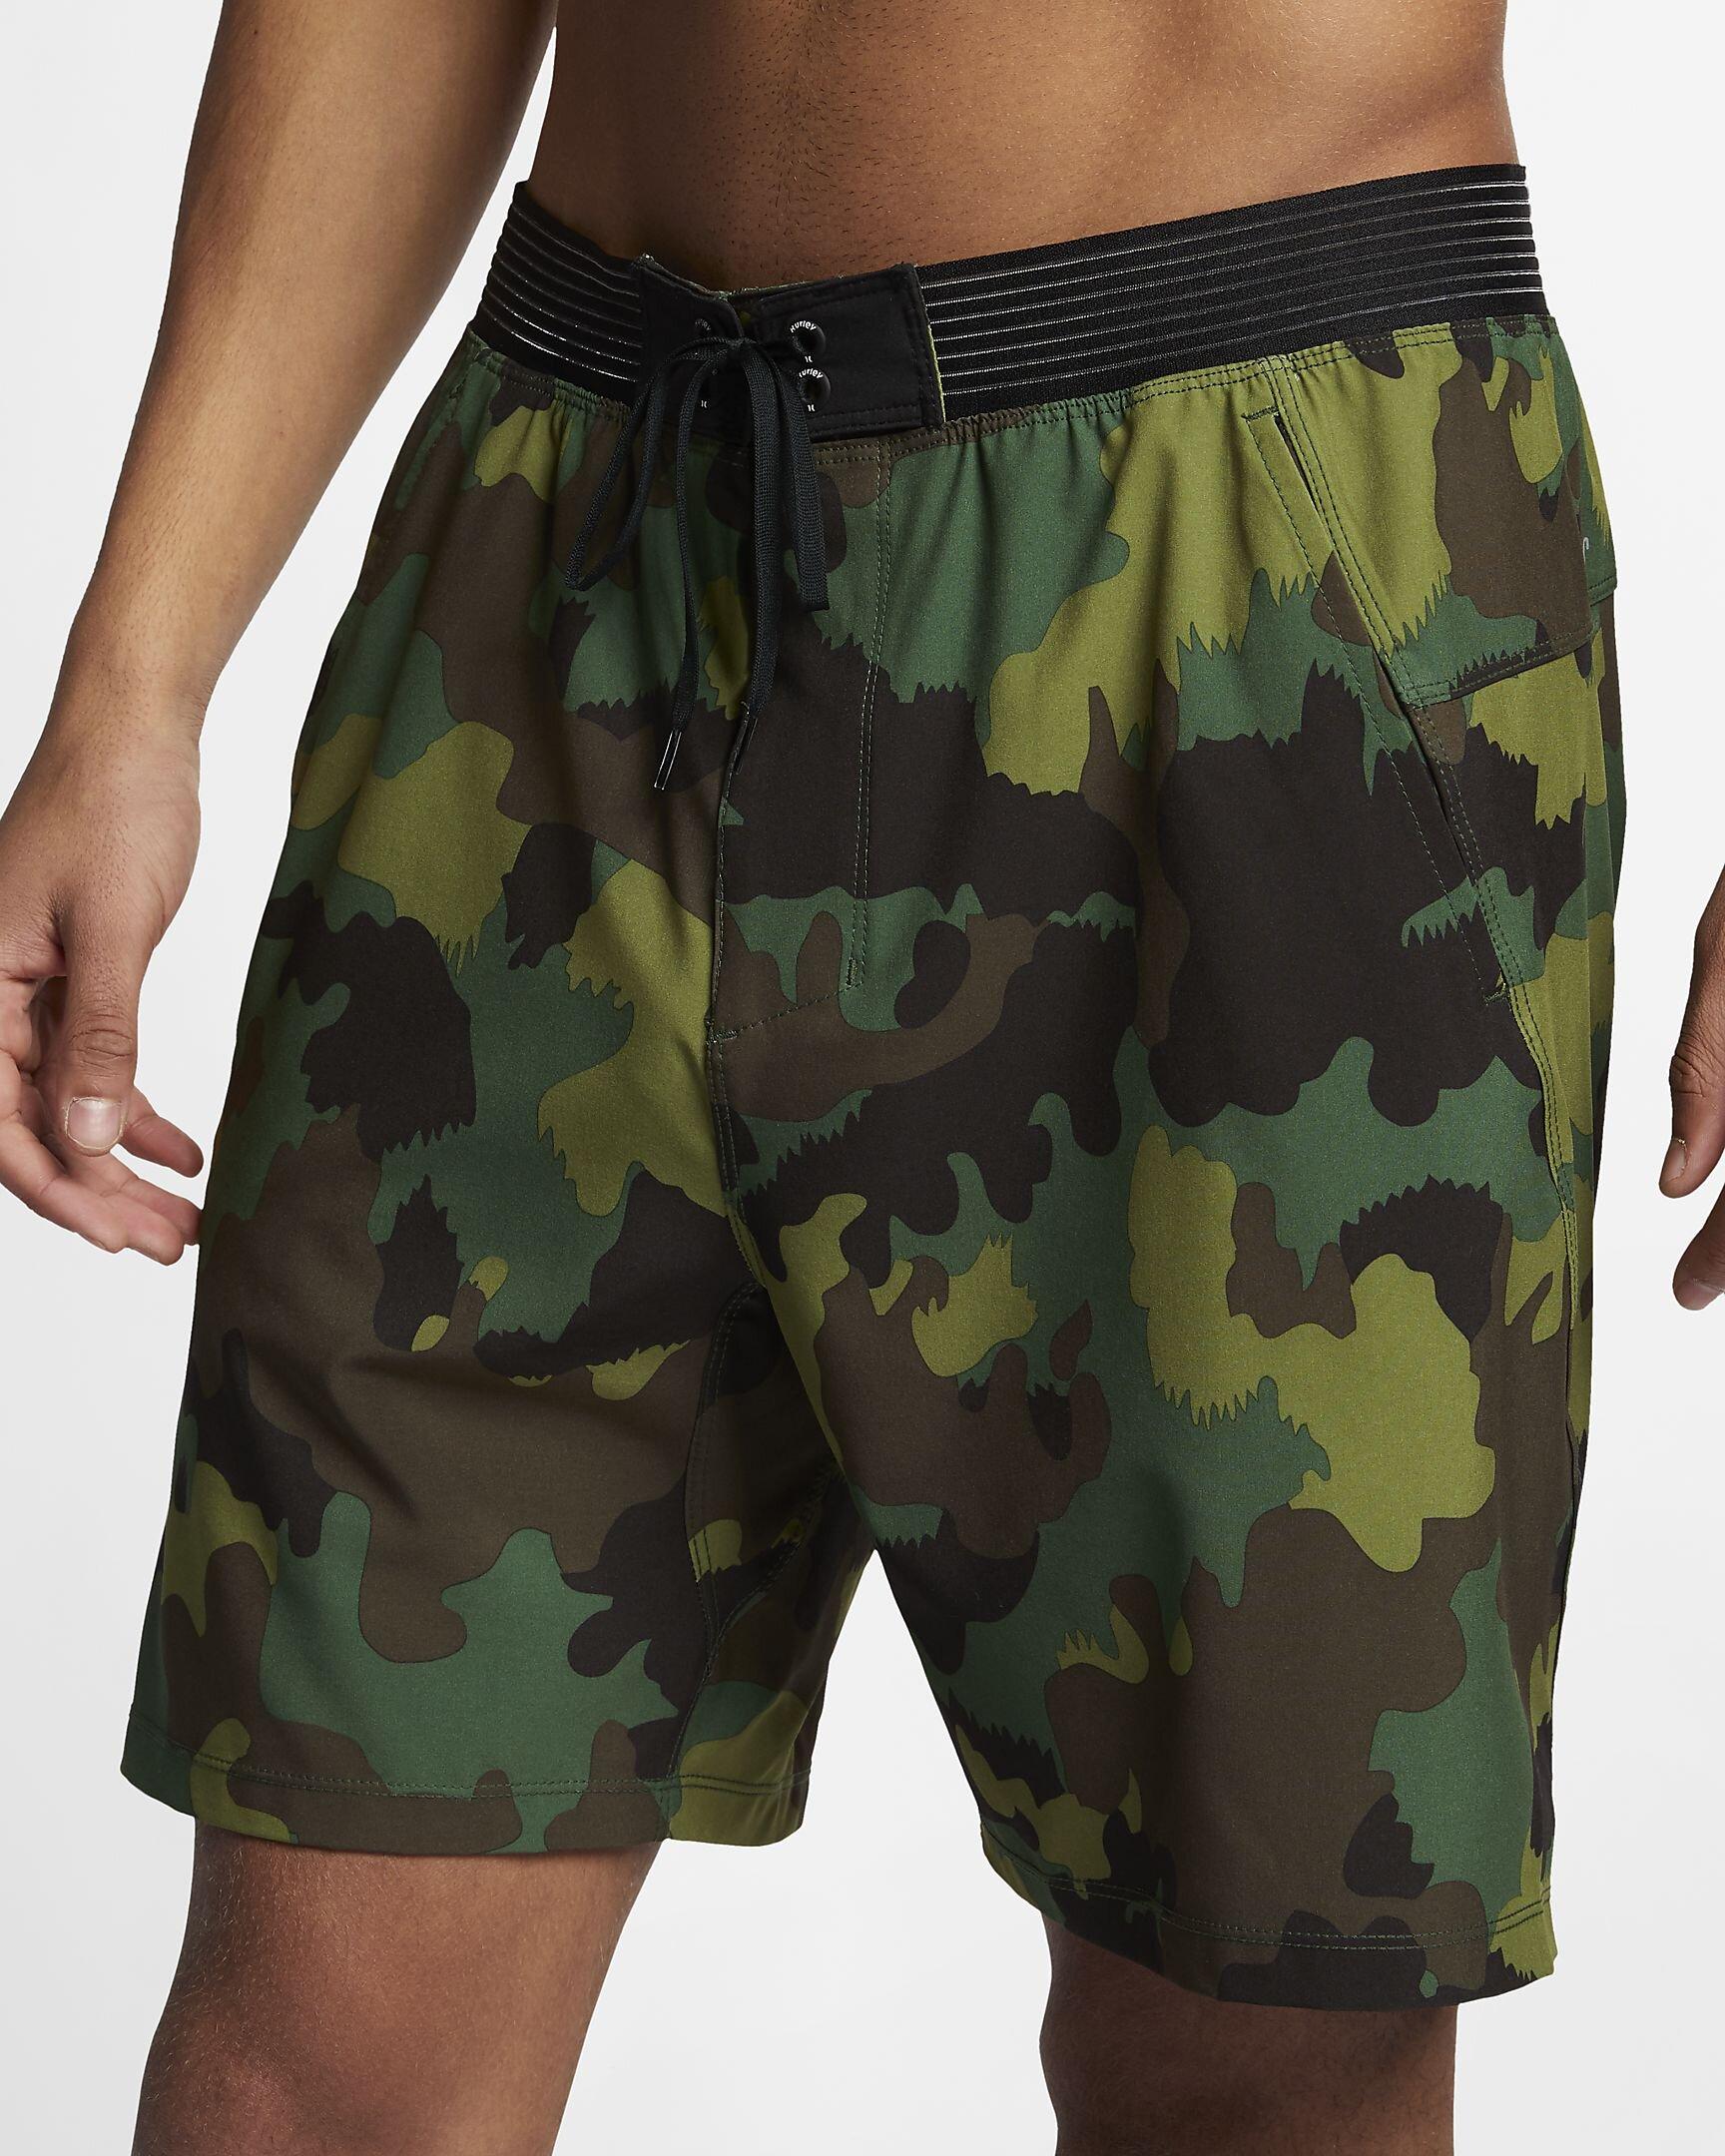 hurley-phantom-alpha-trainer-mens-18-camo-shorts-kJ3XkL-1.jpg